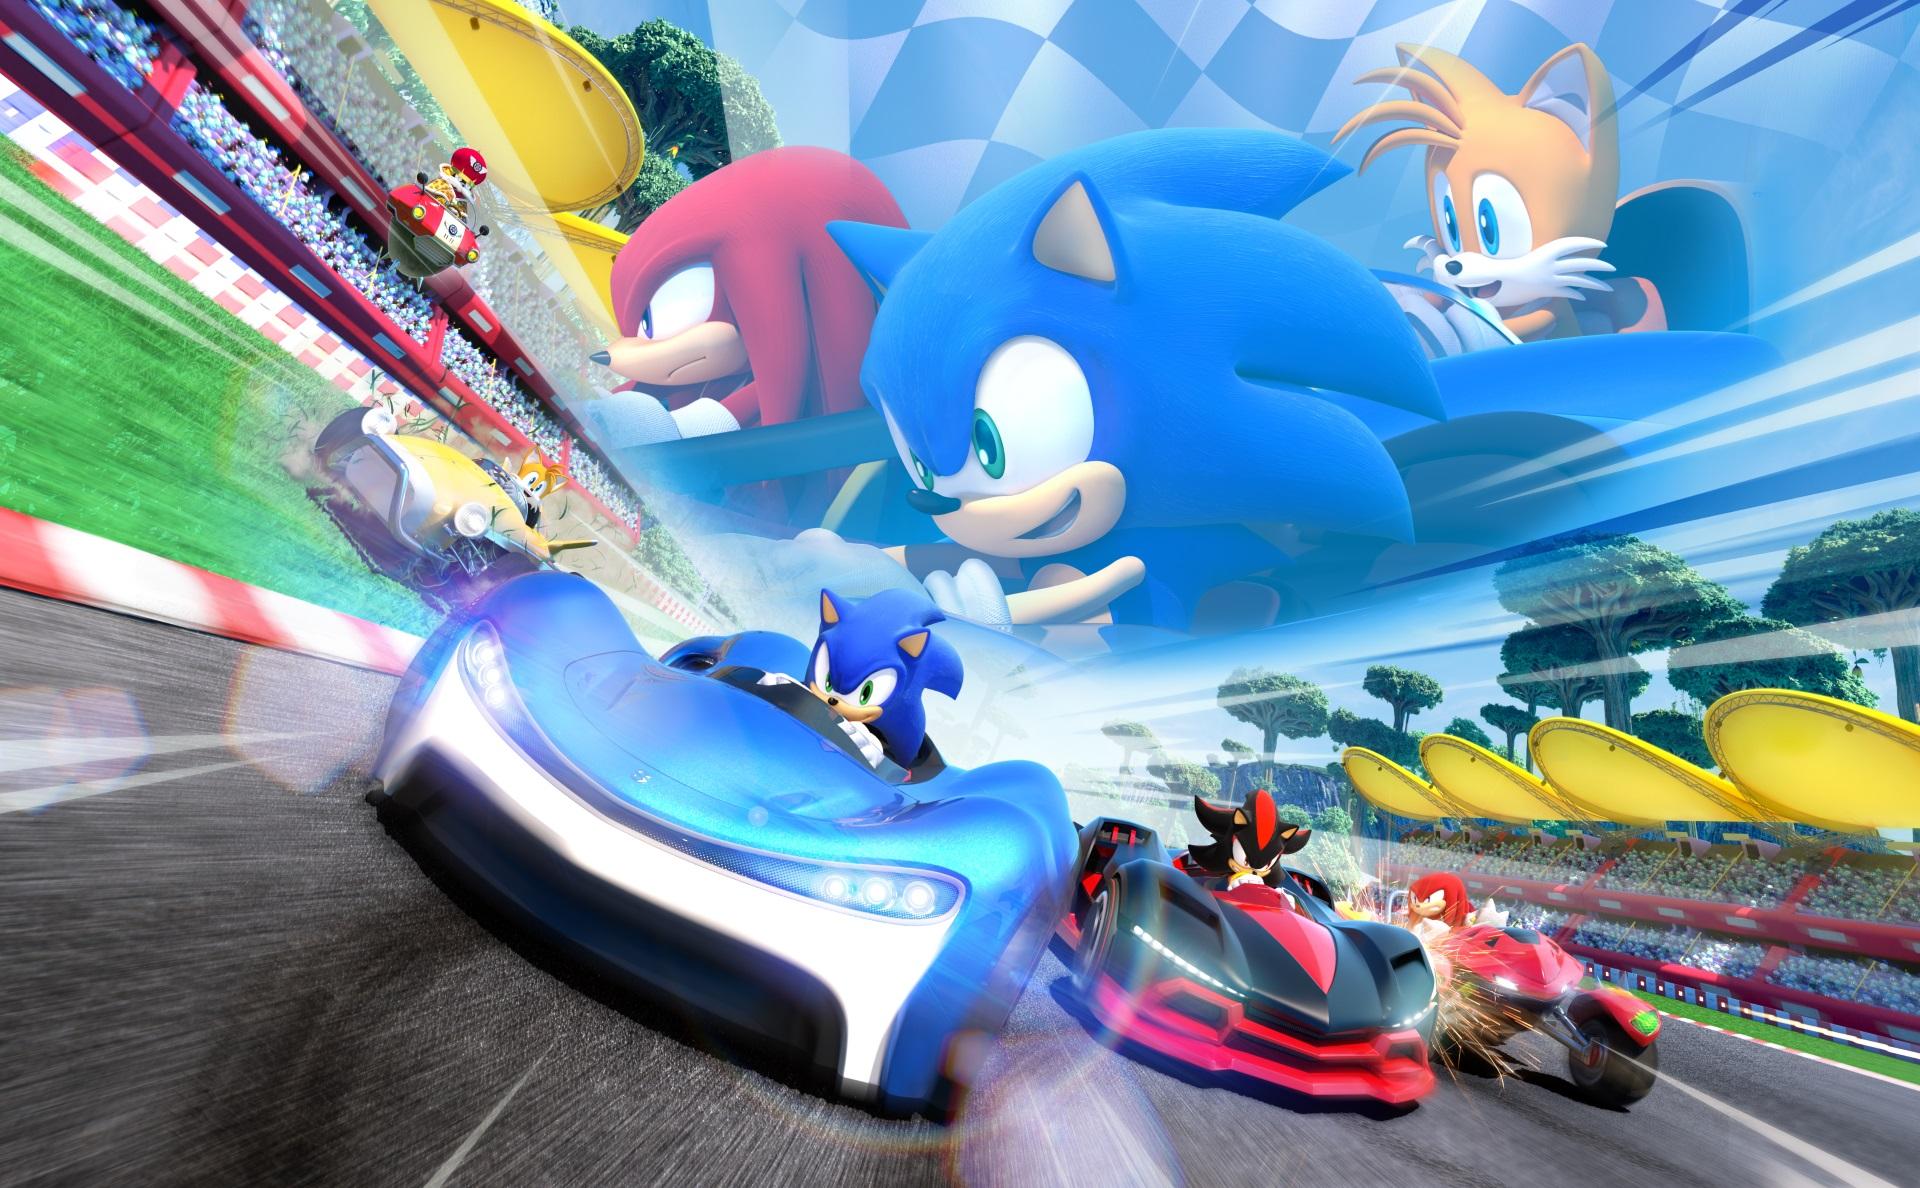 Team Sonic Racing: Always Better Together | MoeGamer